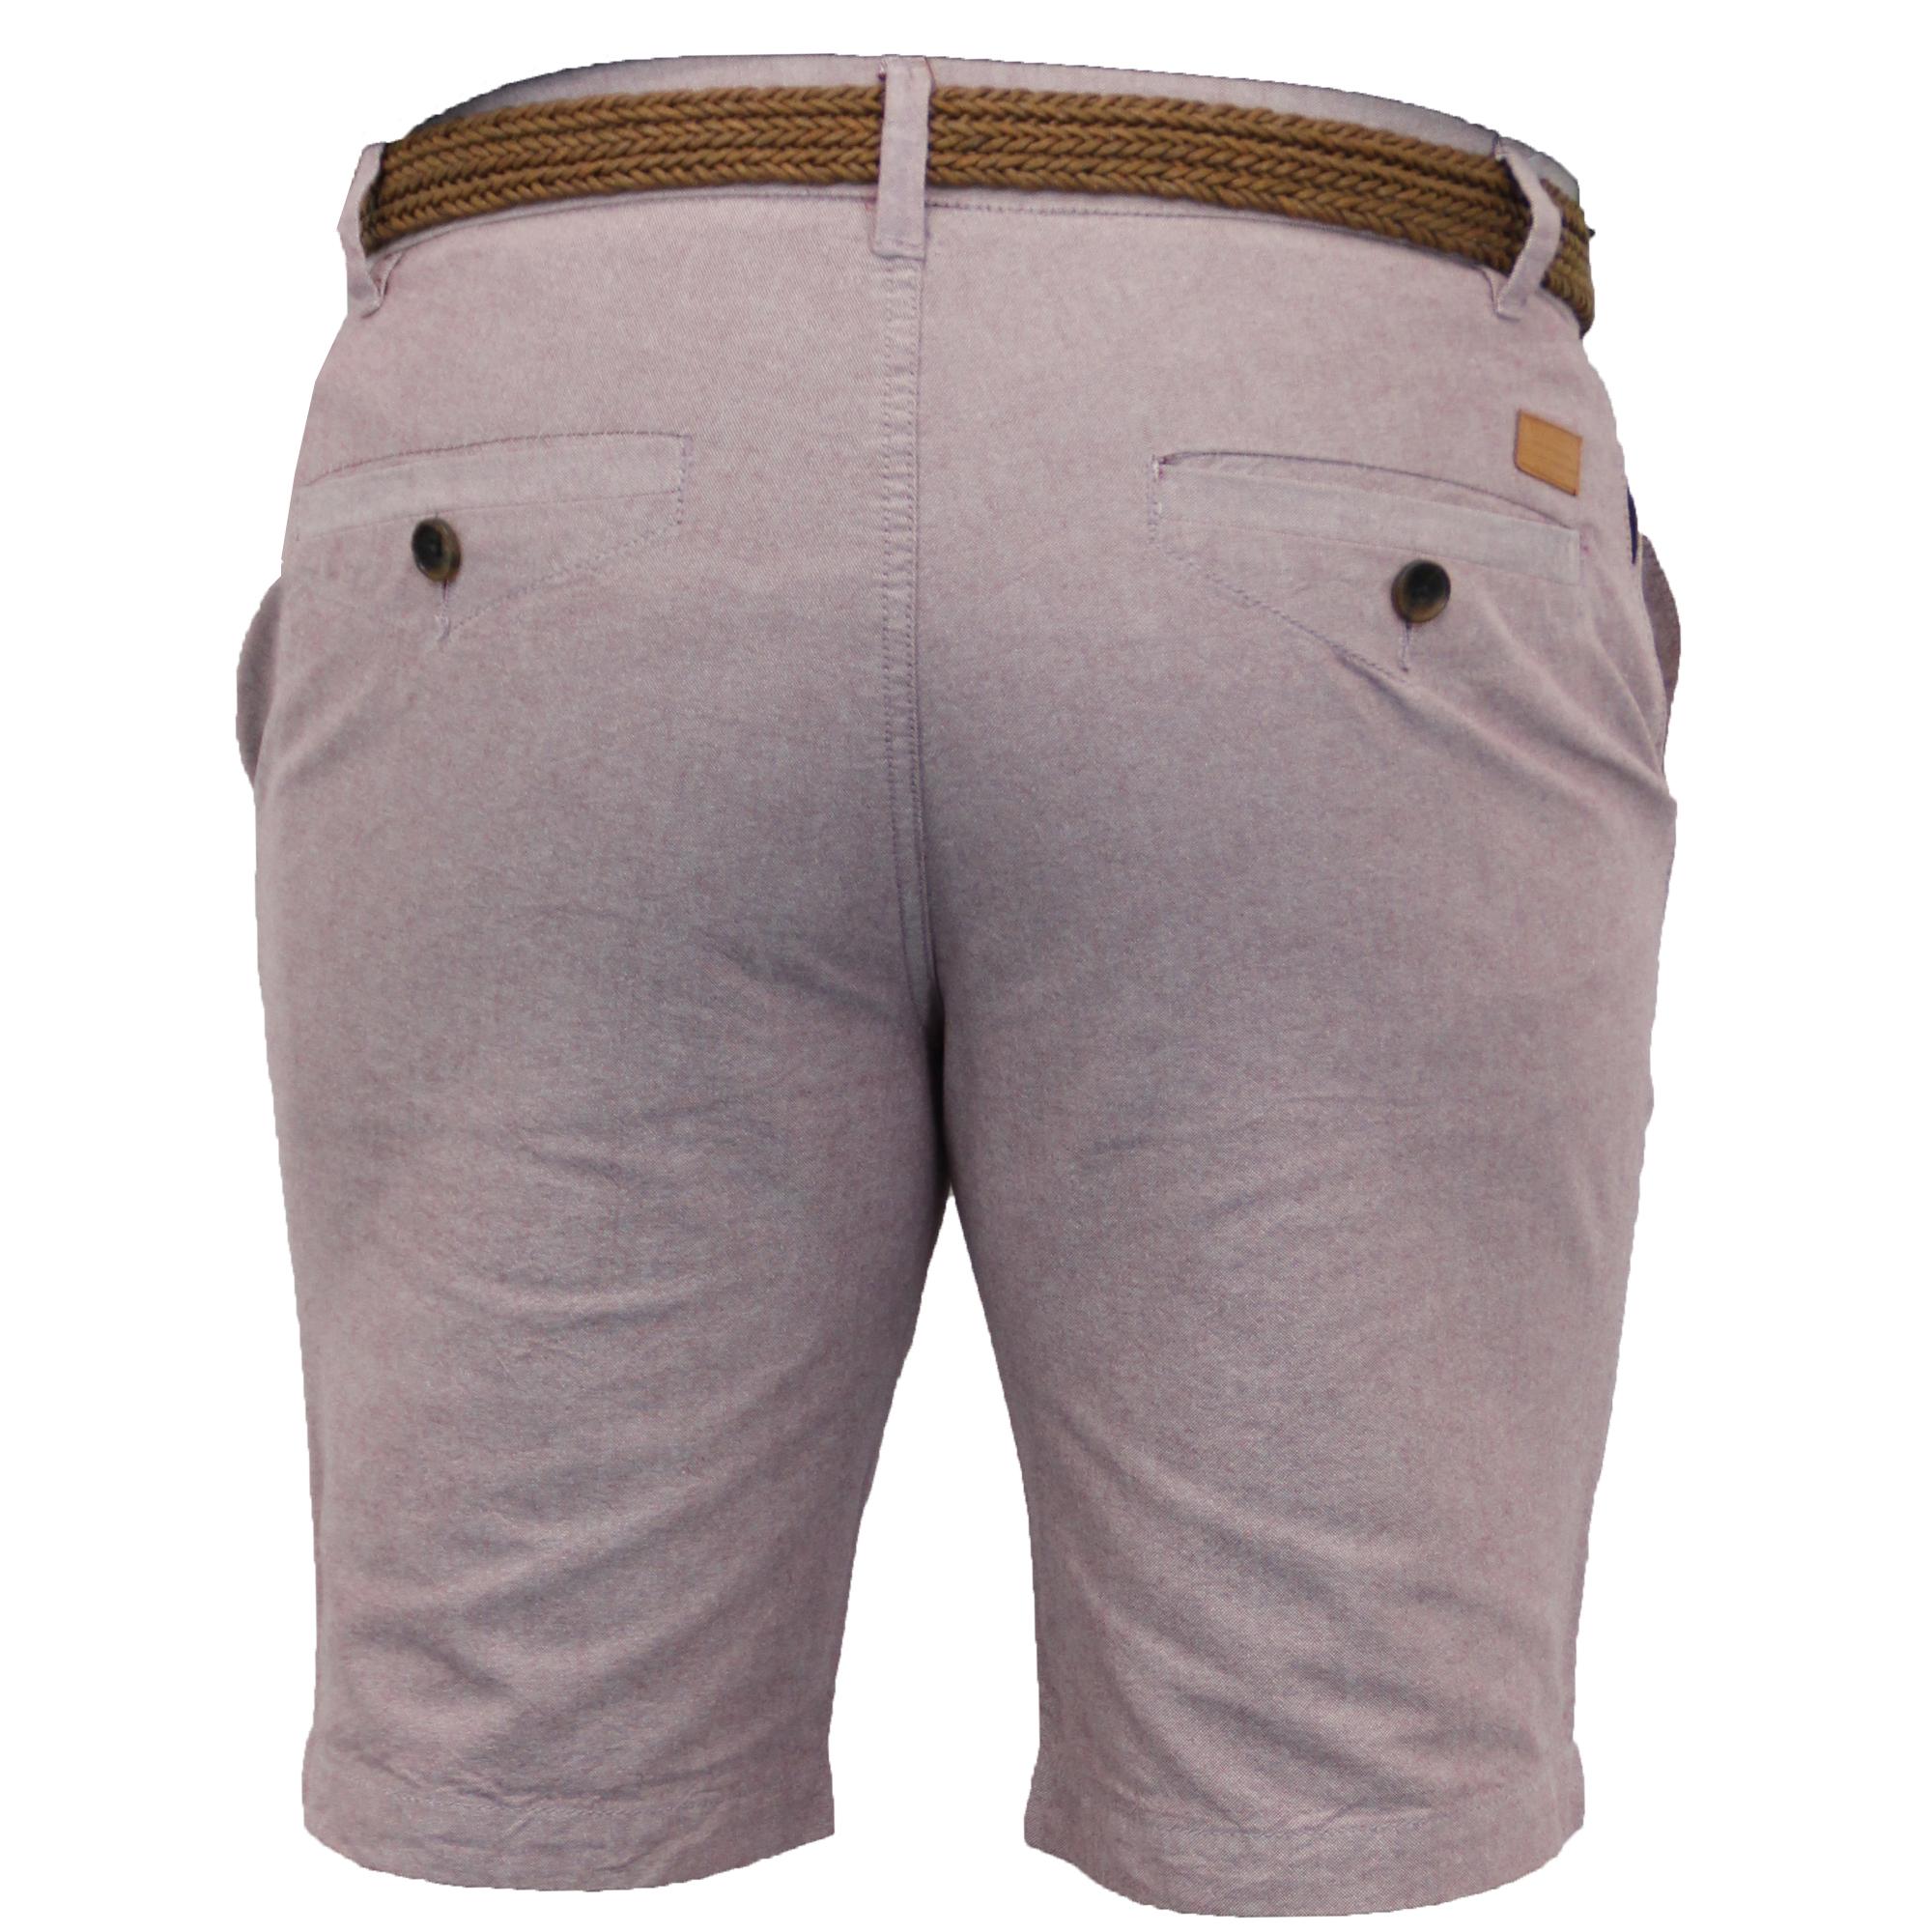 Mens-Cotton-Oxford-Chino-Shorts-Threadbare-Belted-Pants-Knee-Length-Summer-New thumbnail 8